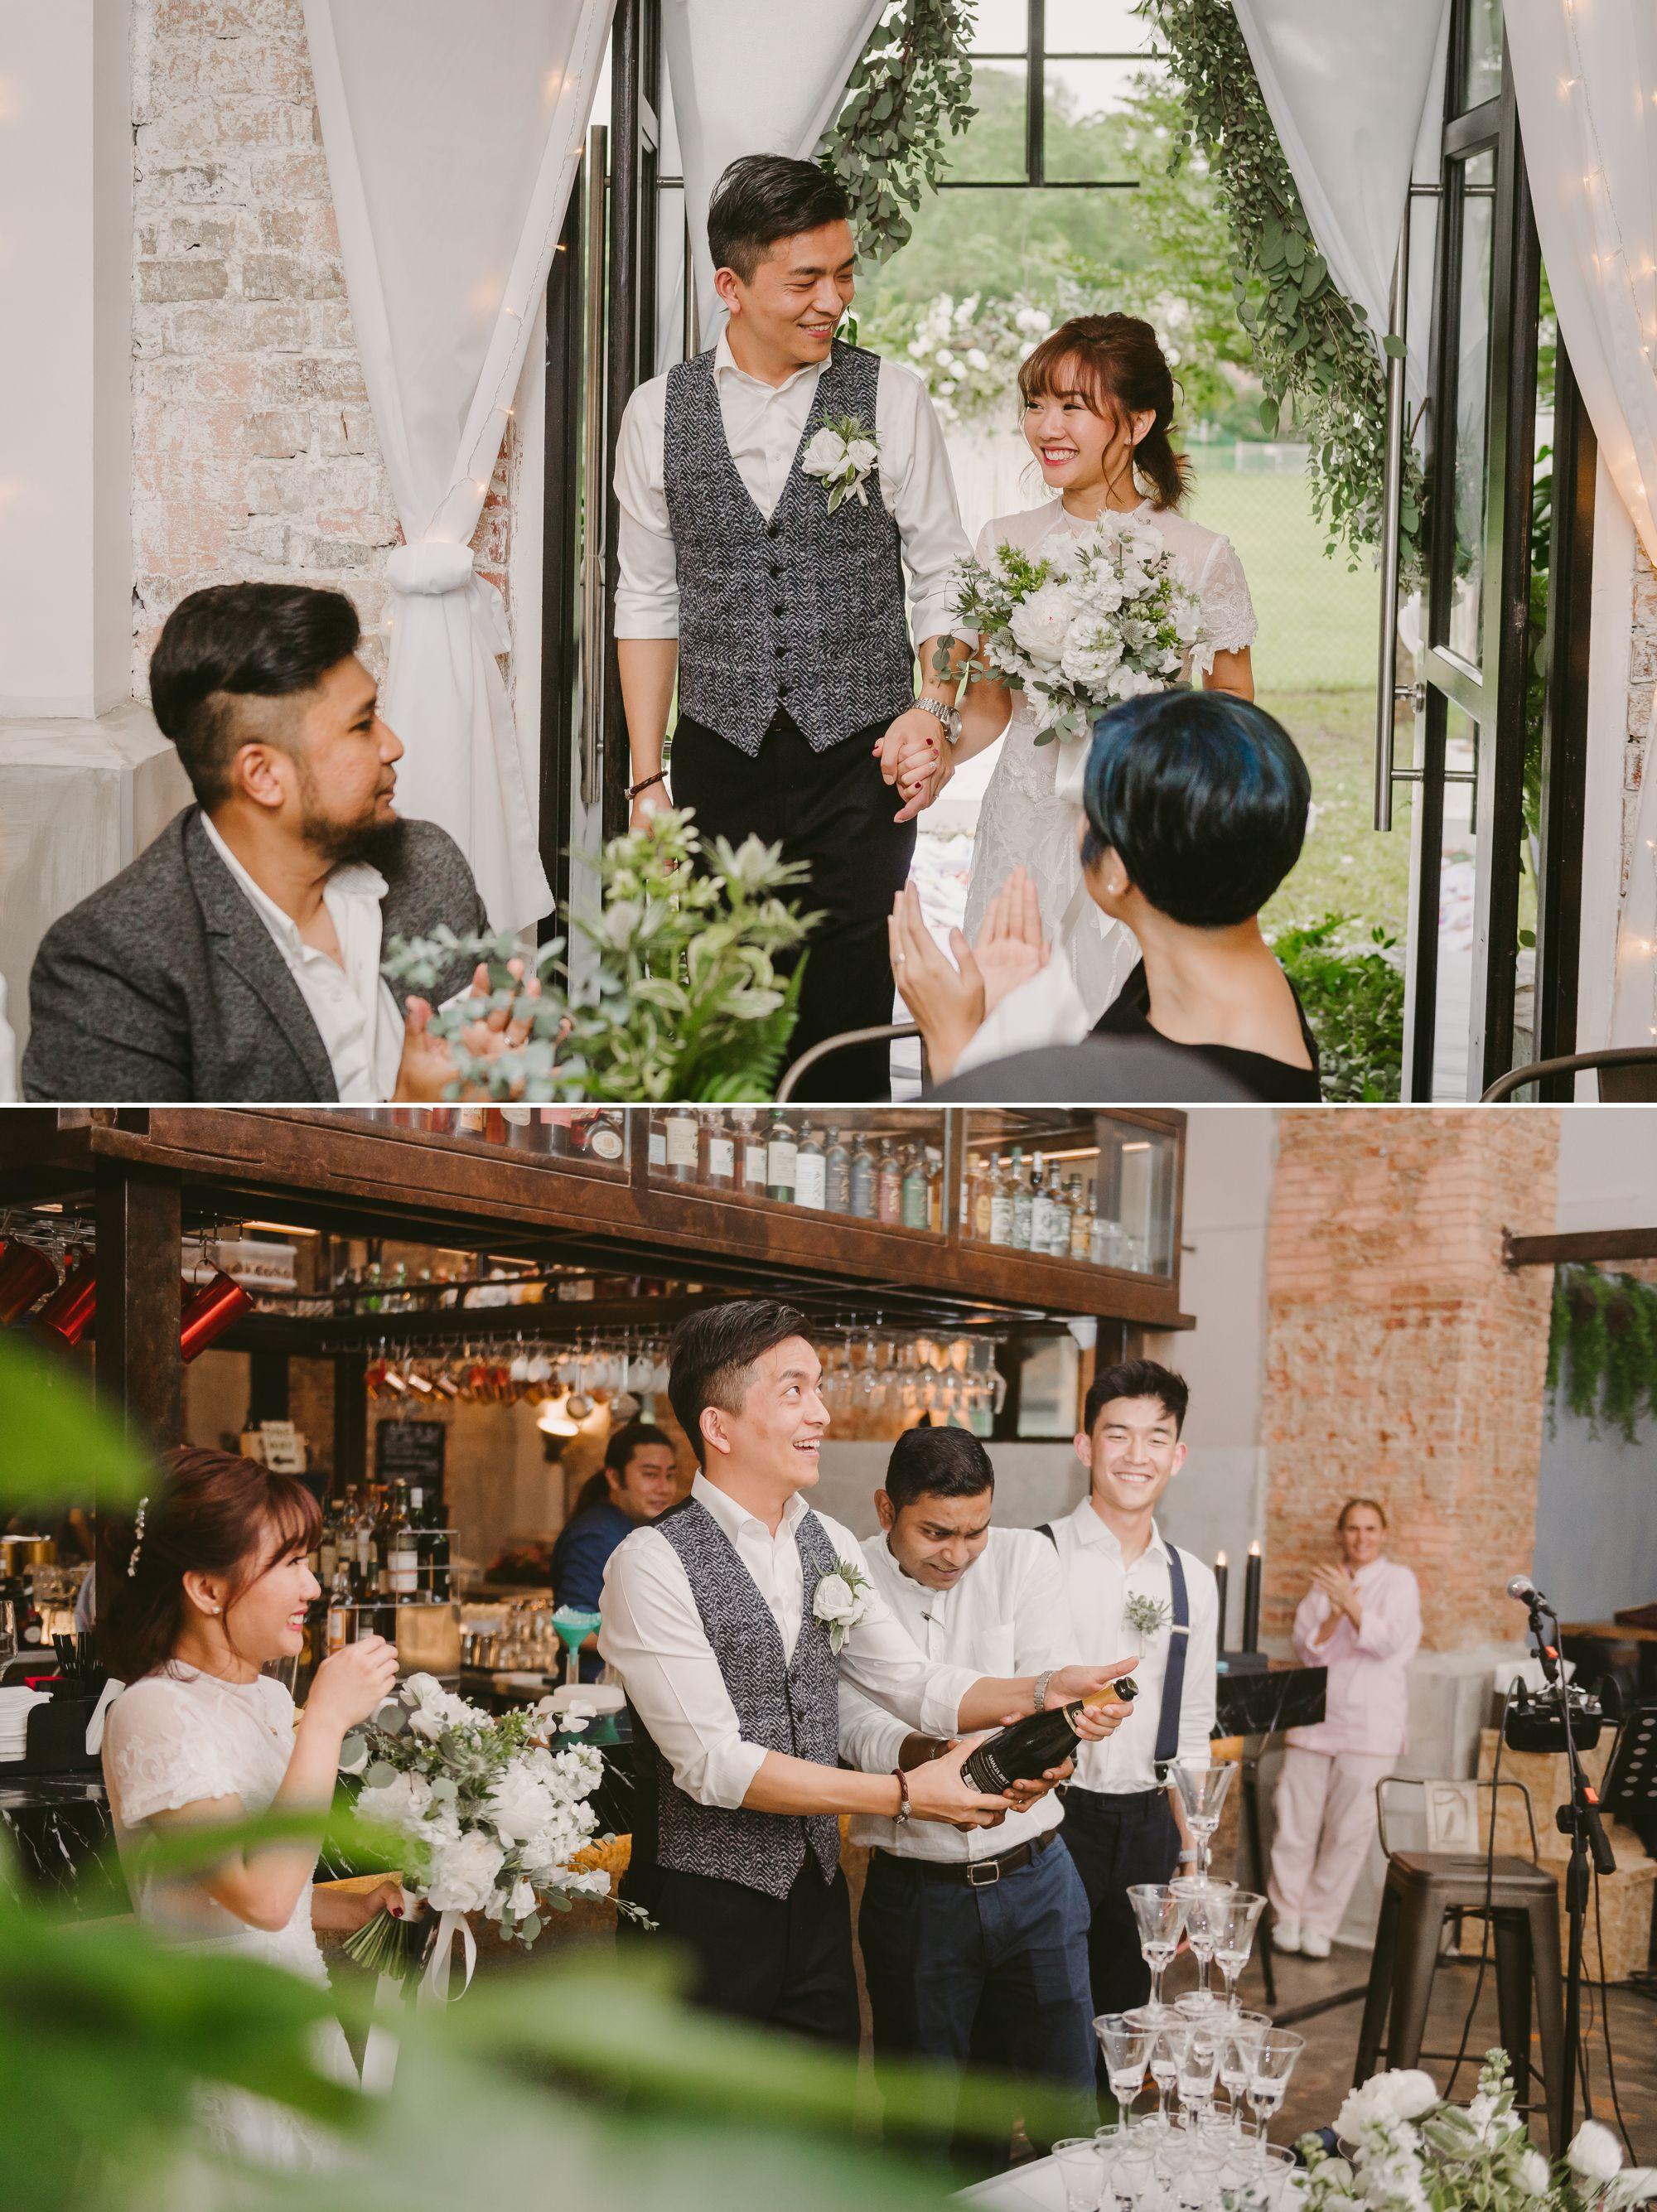 wedding_photography 28.jpg